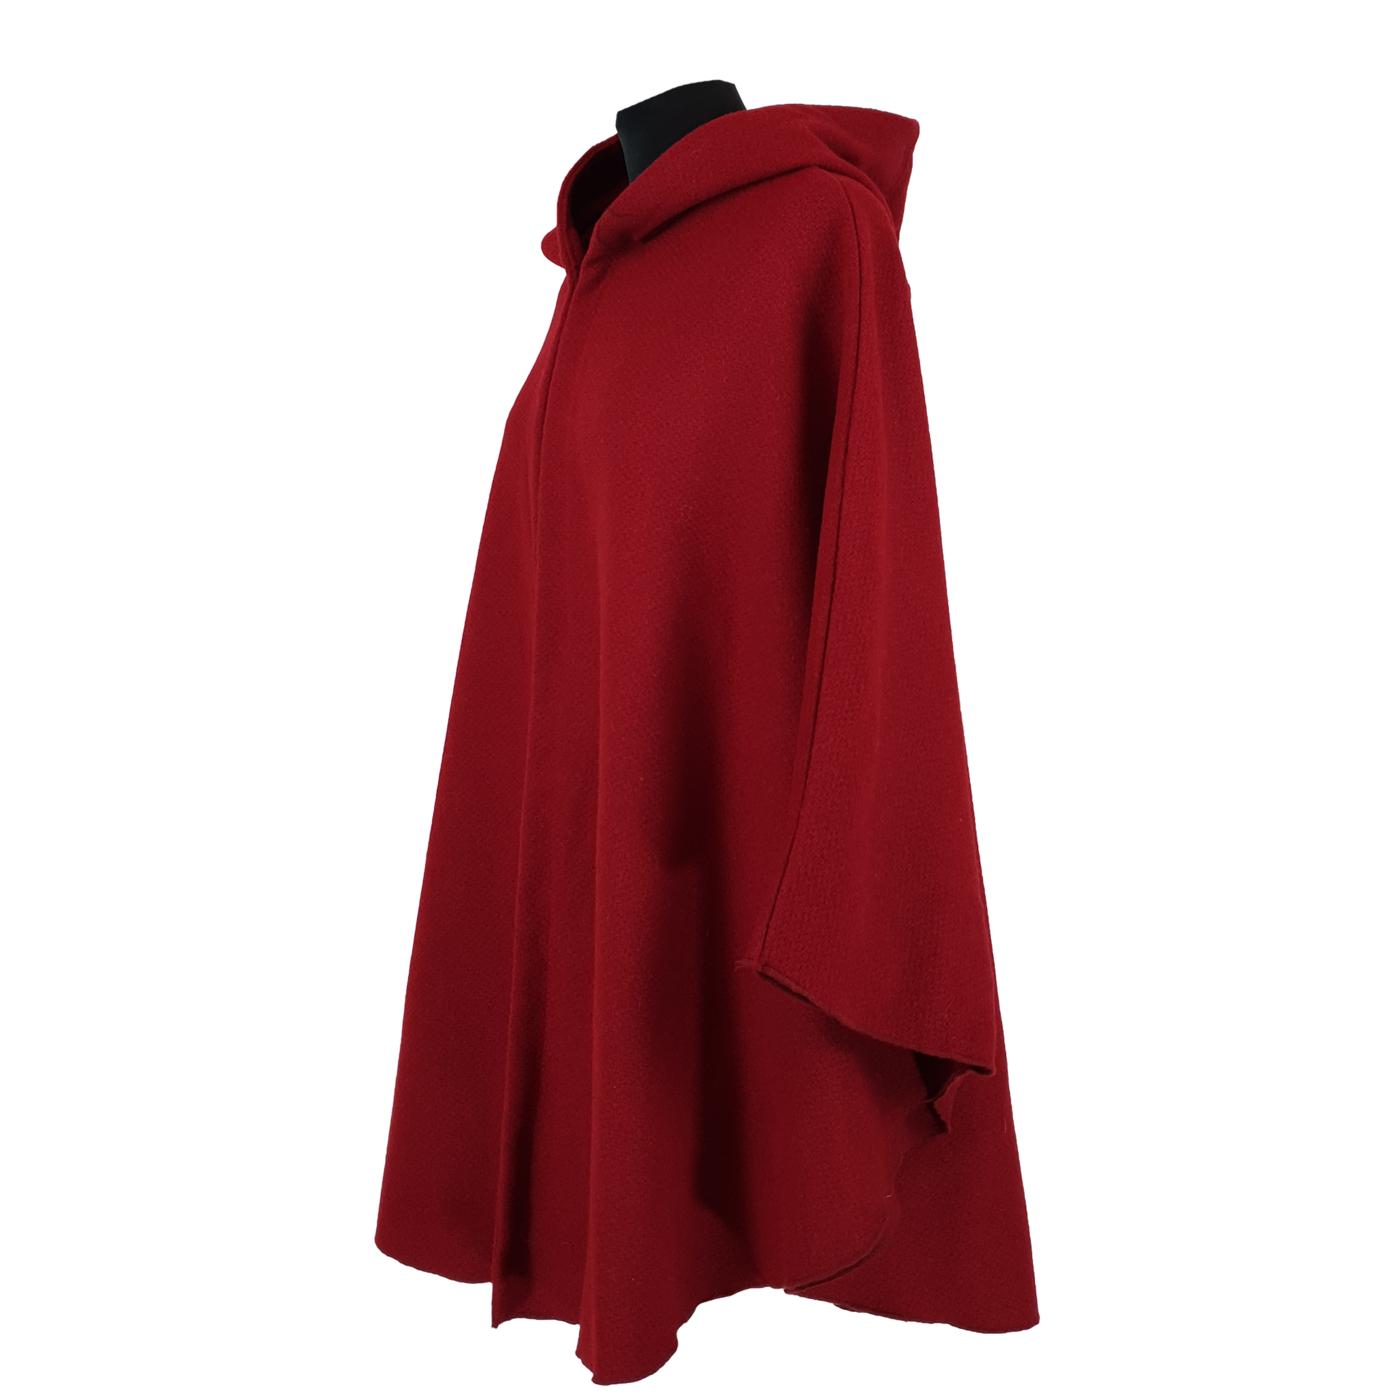 Télécharger photo red cape png